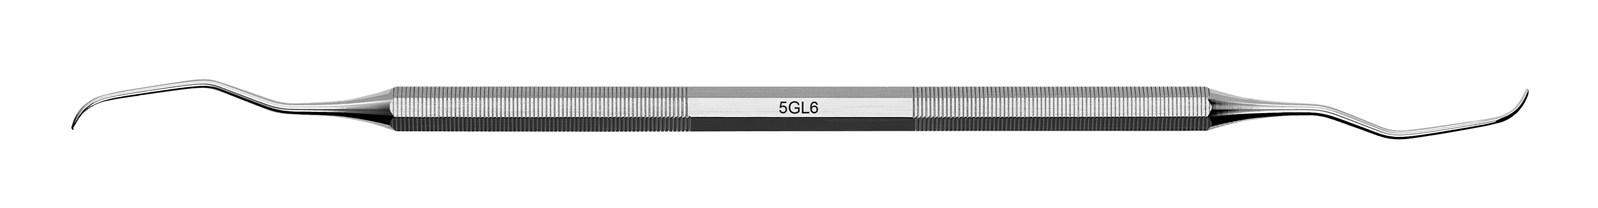 Kyreta Gracey Deep - 5GL6, ADEP tmavě modrý